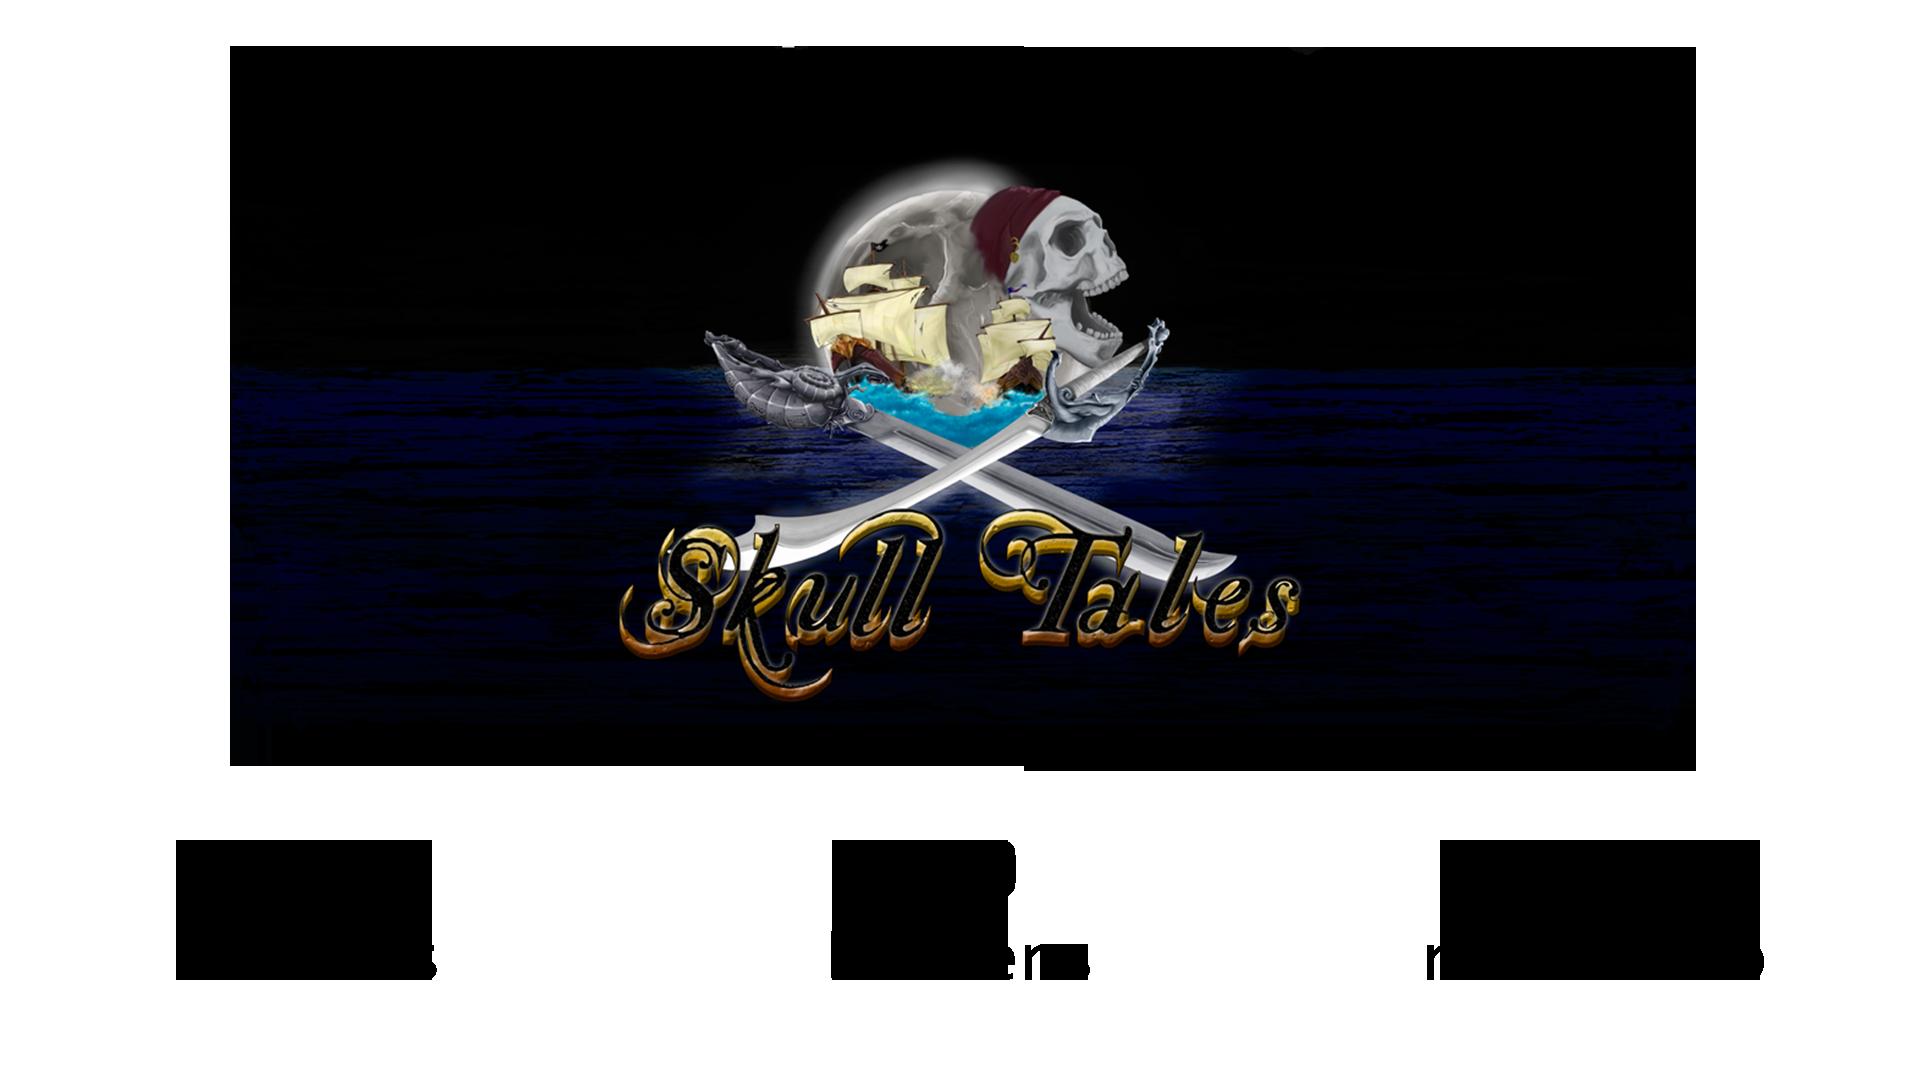 skull tales proyecto kickstarter españa SYBIC crowdfunding